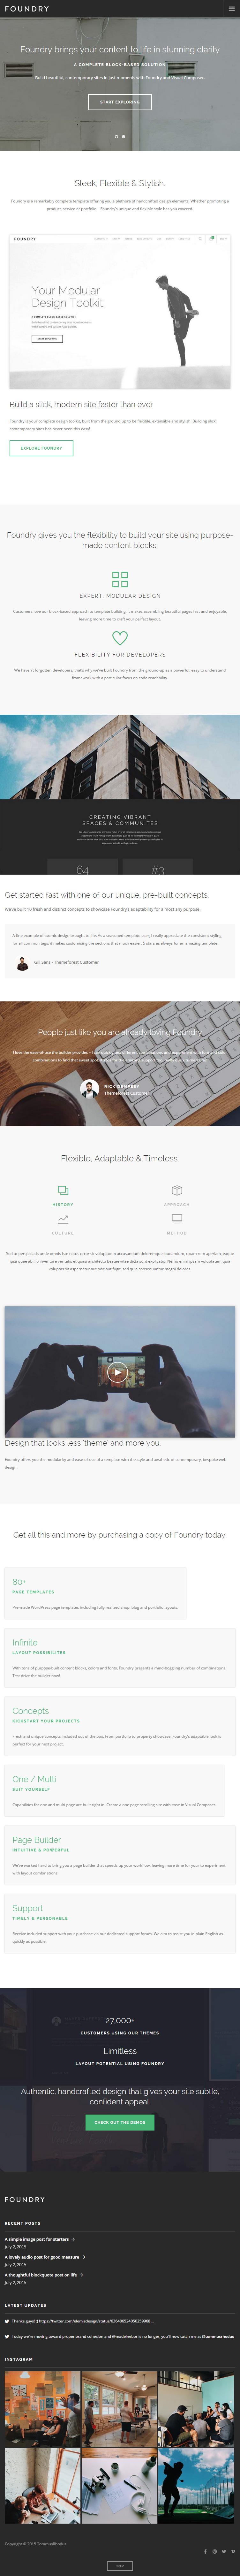 Foundry Premium Responsive Multi Concept Wordpress Theme